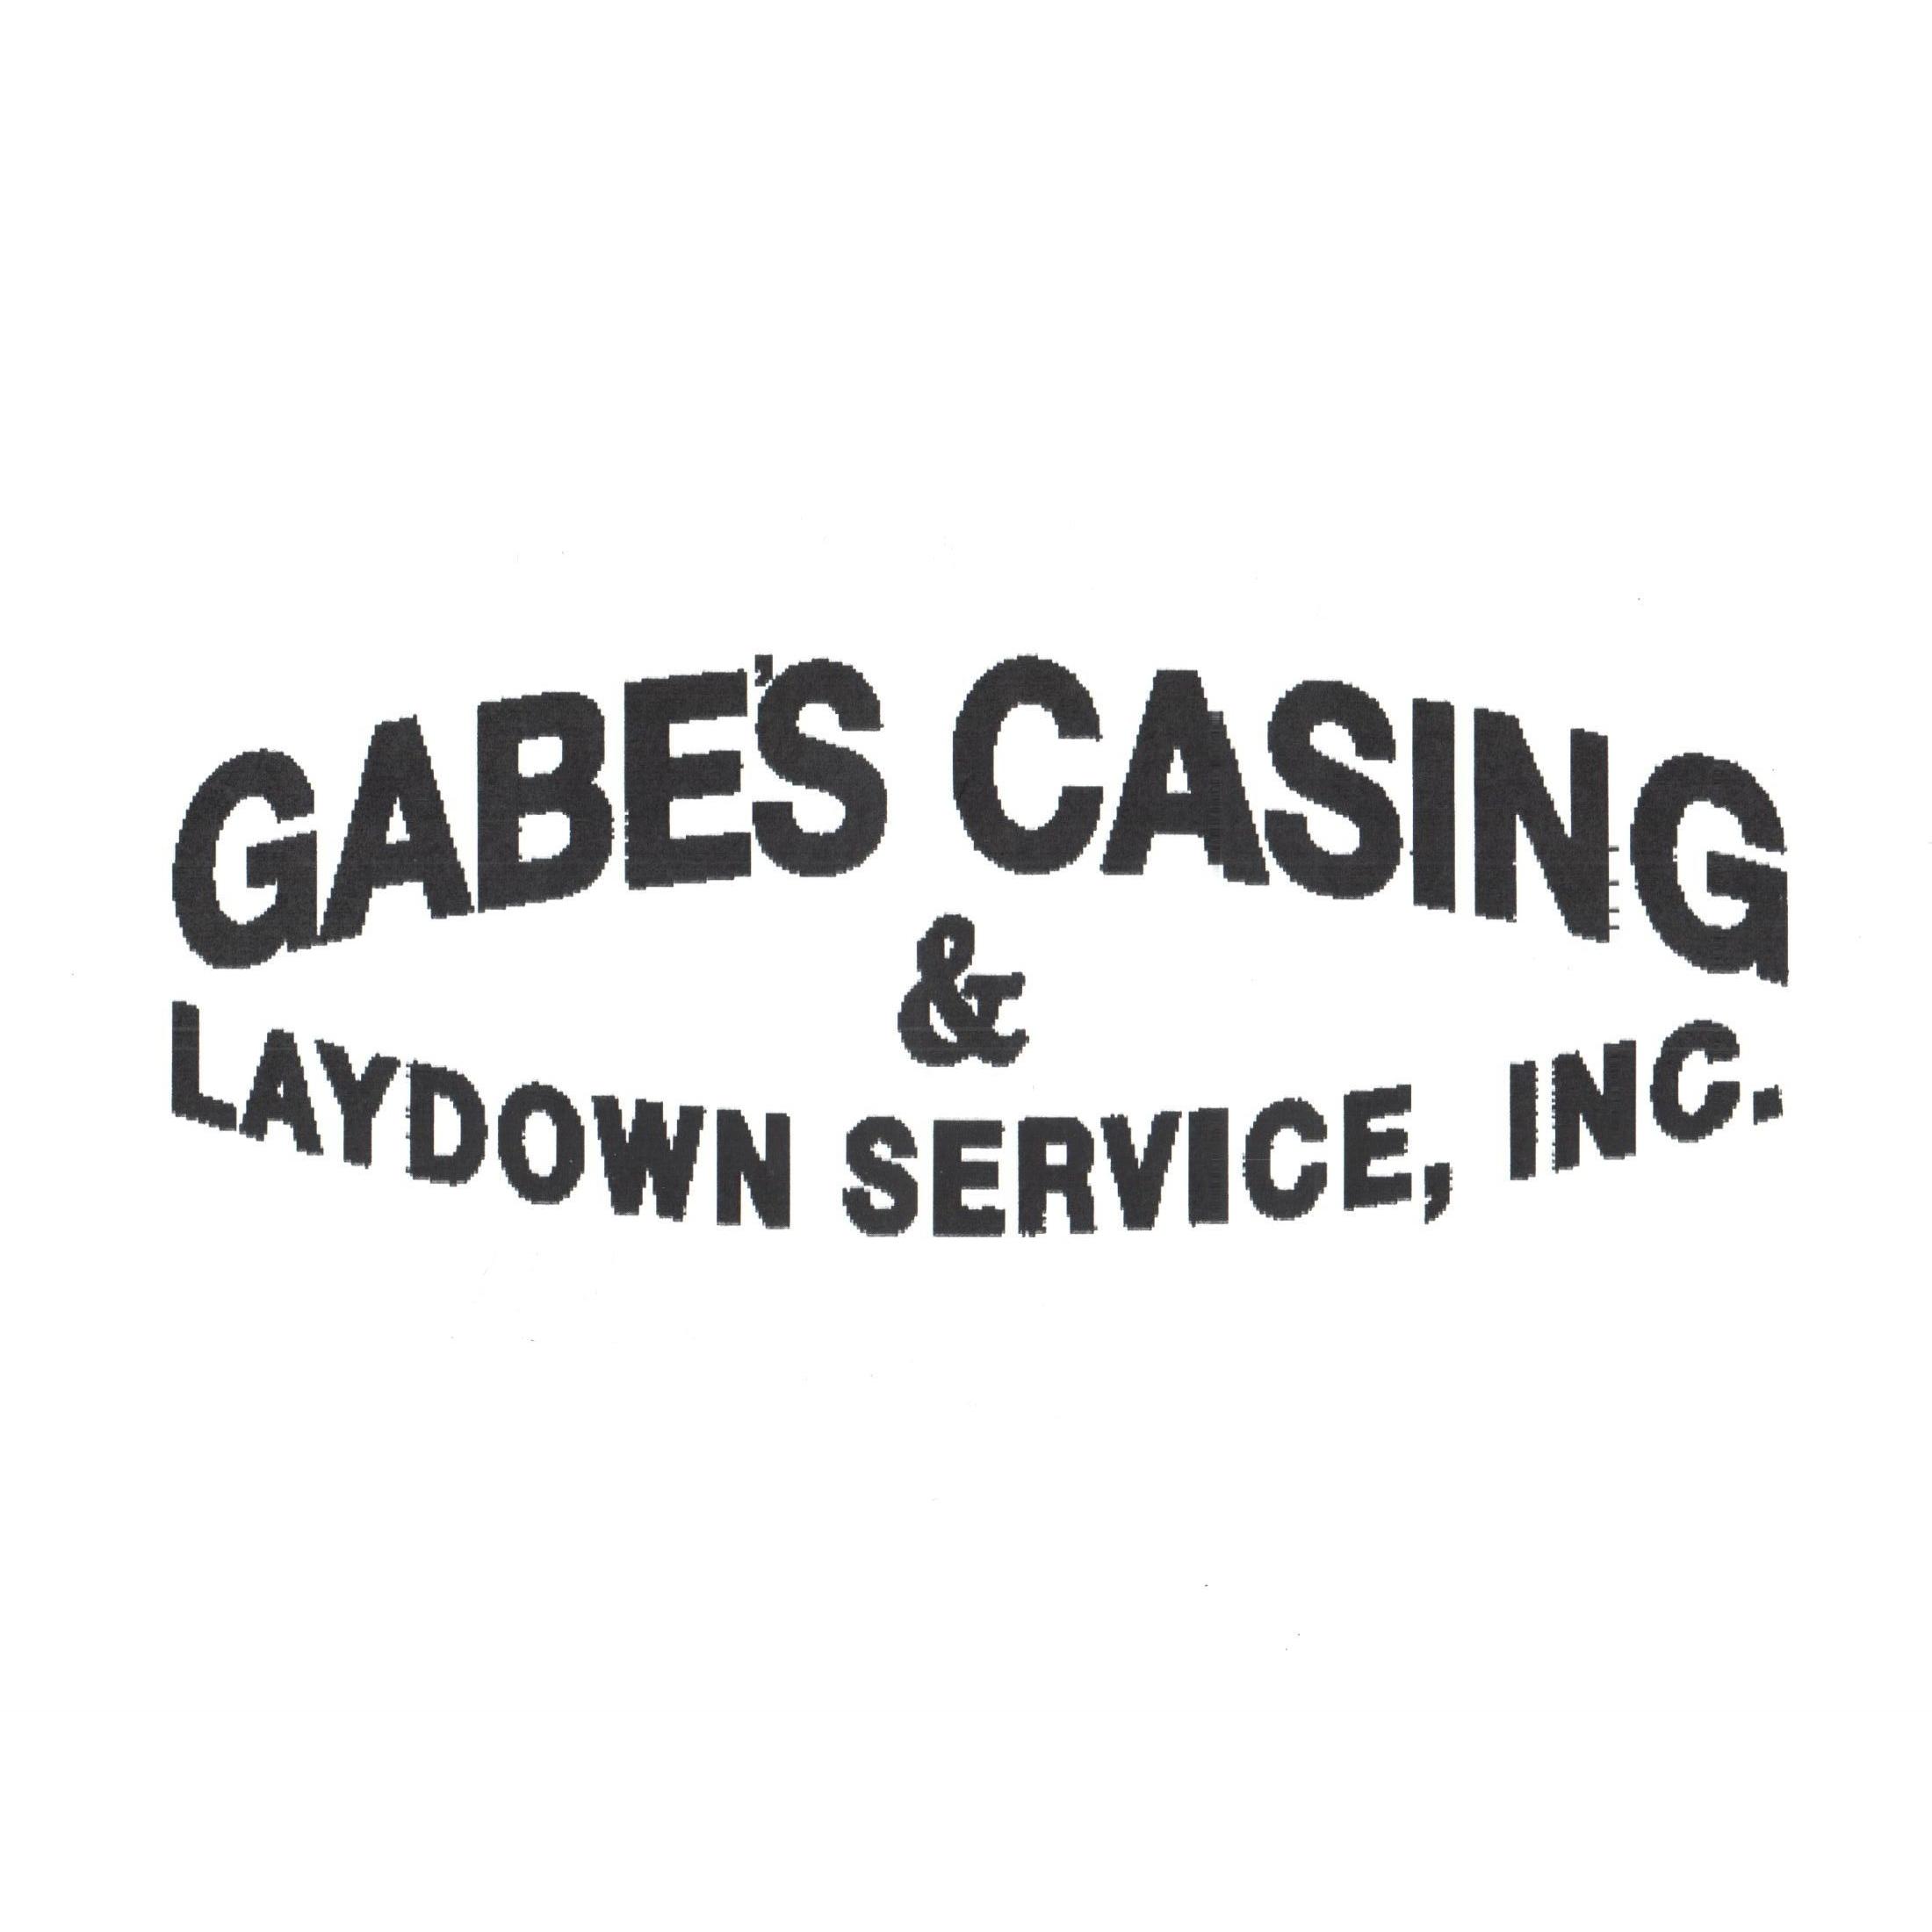 gabes casing & laydown service